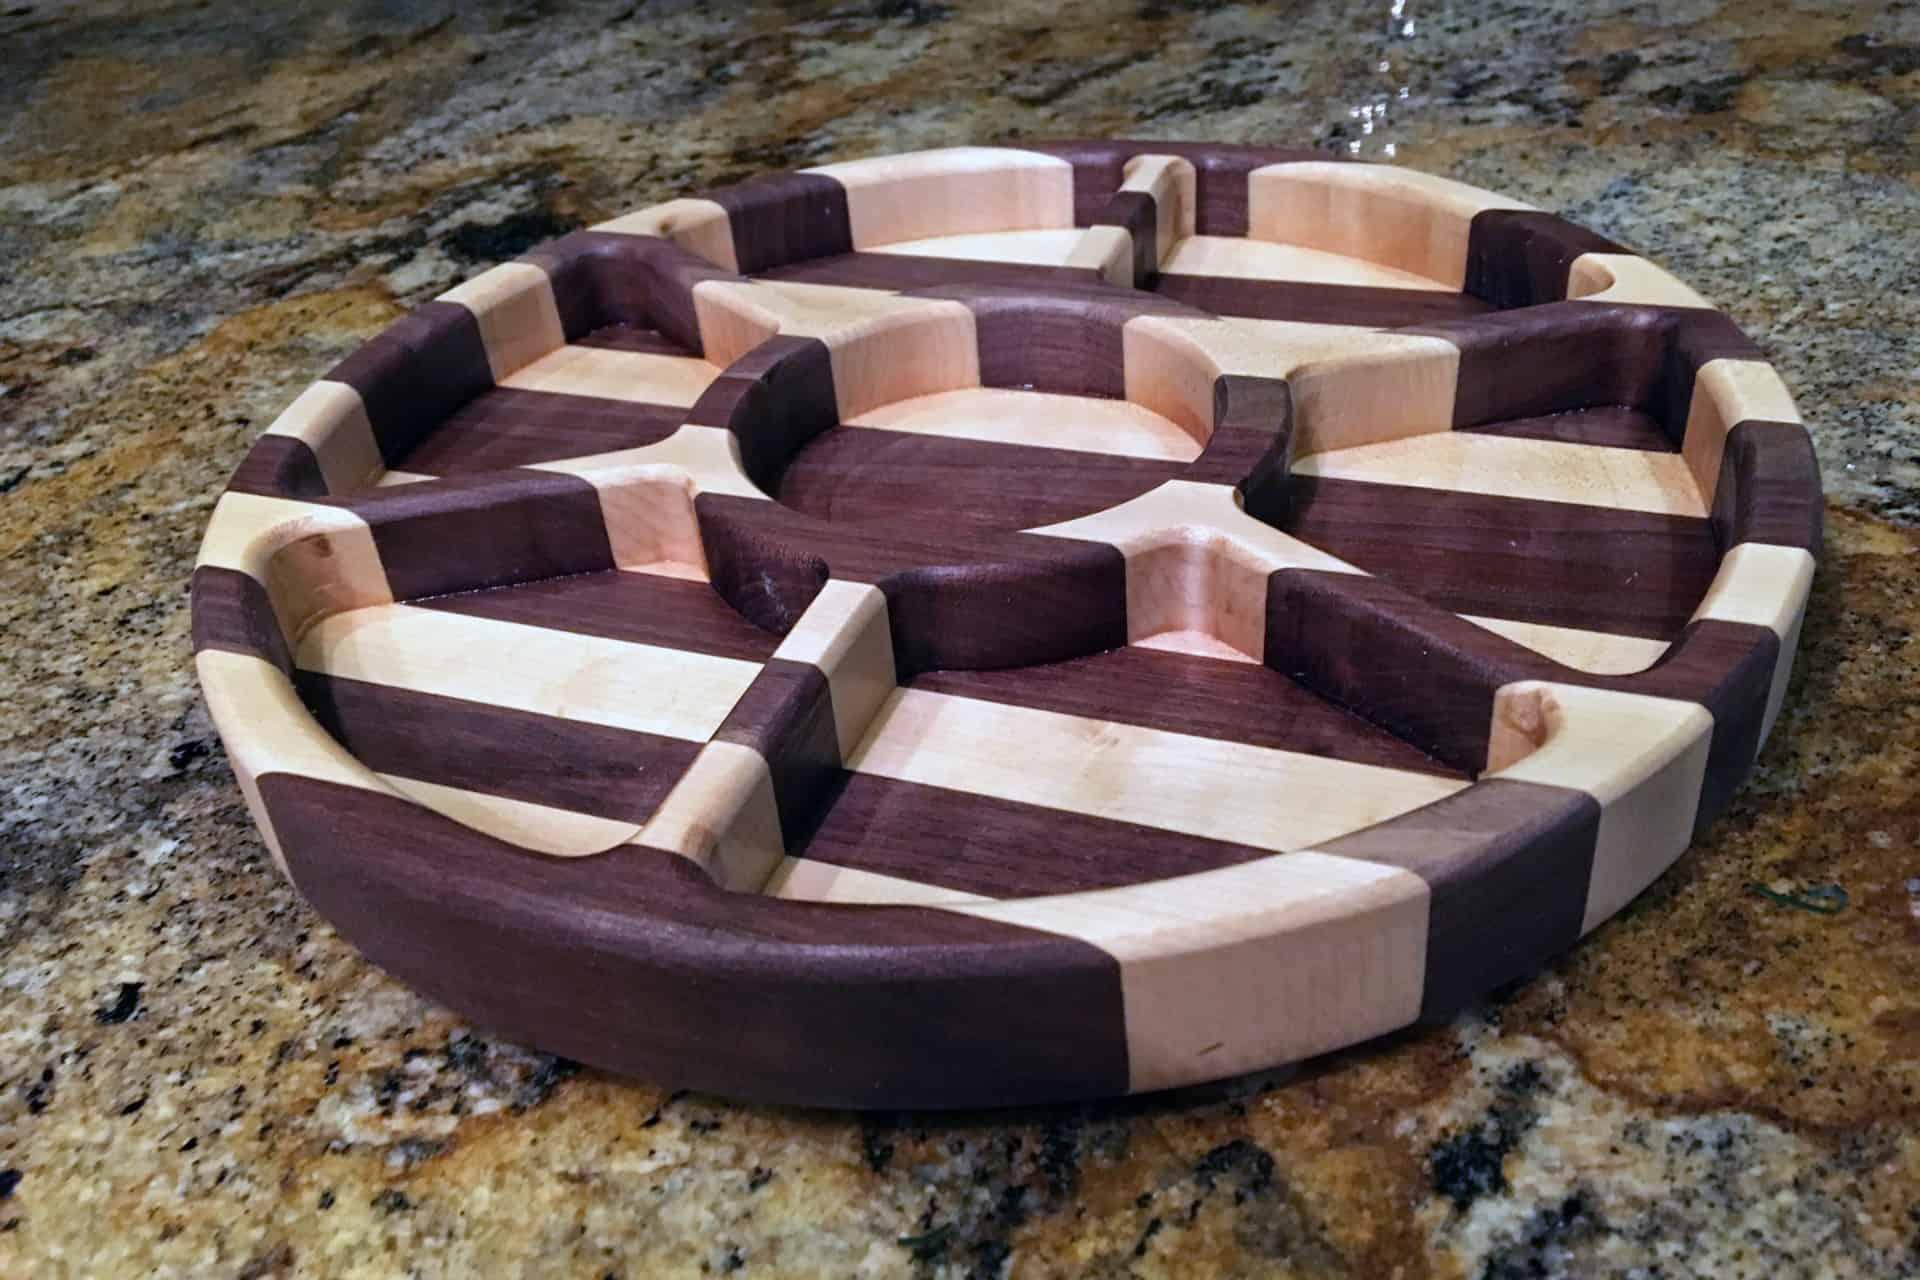 make a party serving tray hand tools vs cnc the geek pub. Black Bedroom Furniture Sets. Home Design Ideas